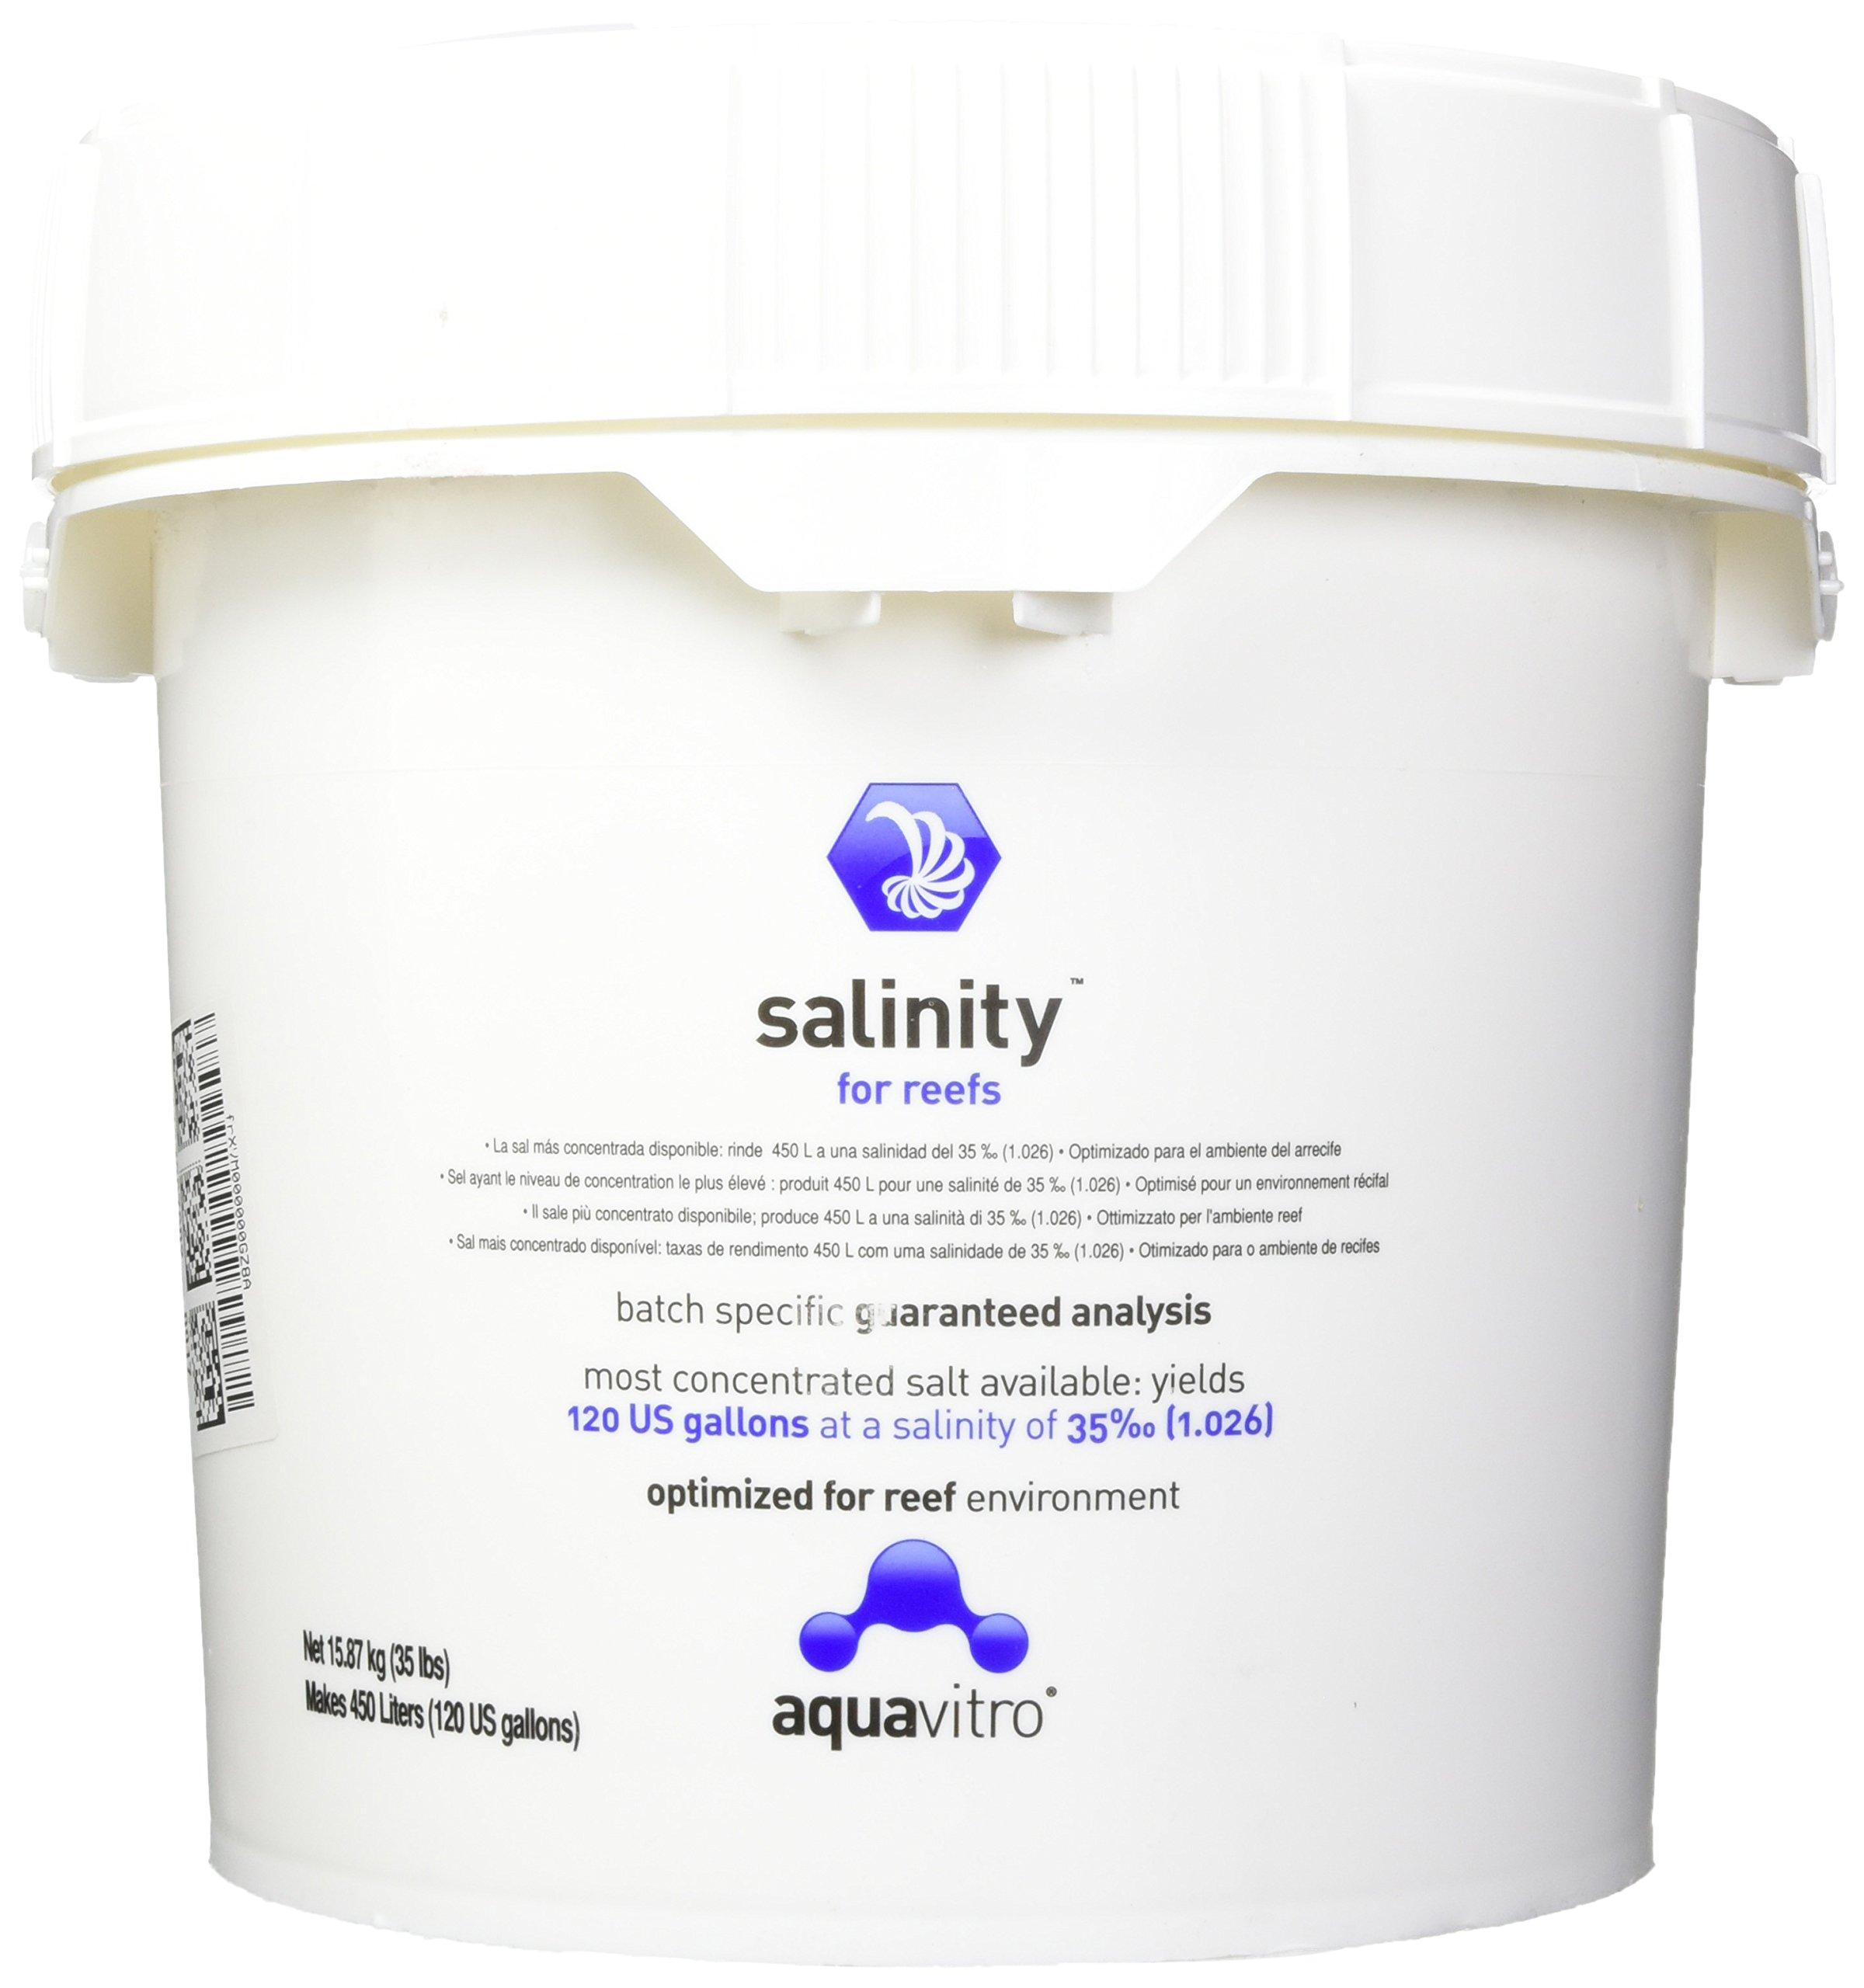 Seachem Laboratories ASM7582 Salinity for Reefs Aquarium Systems, 450-Liter